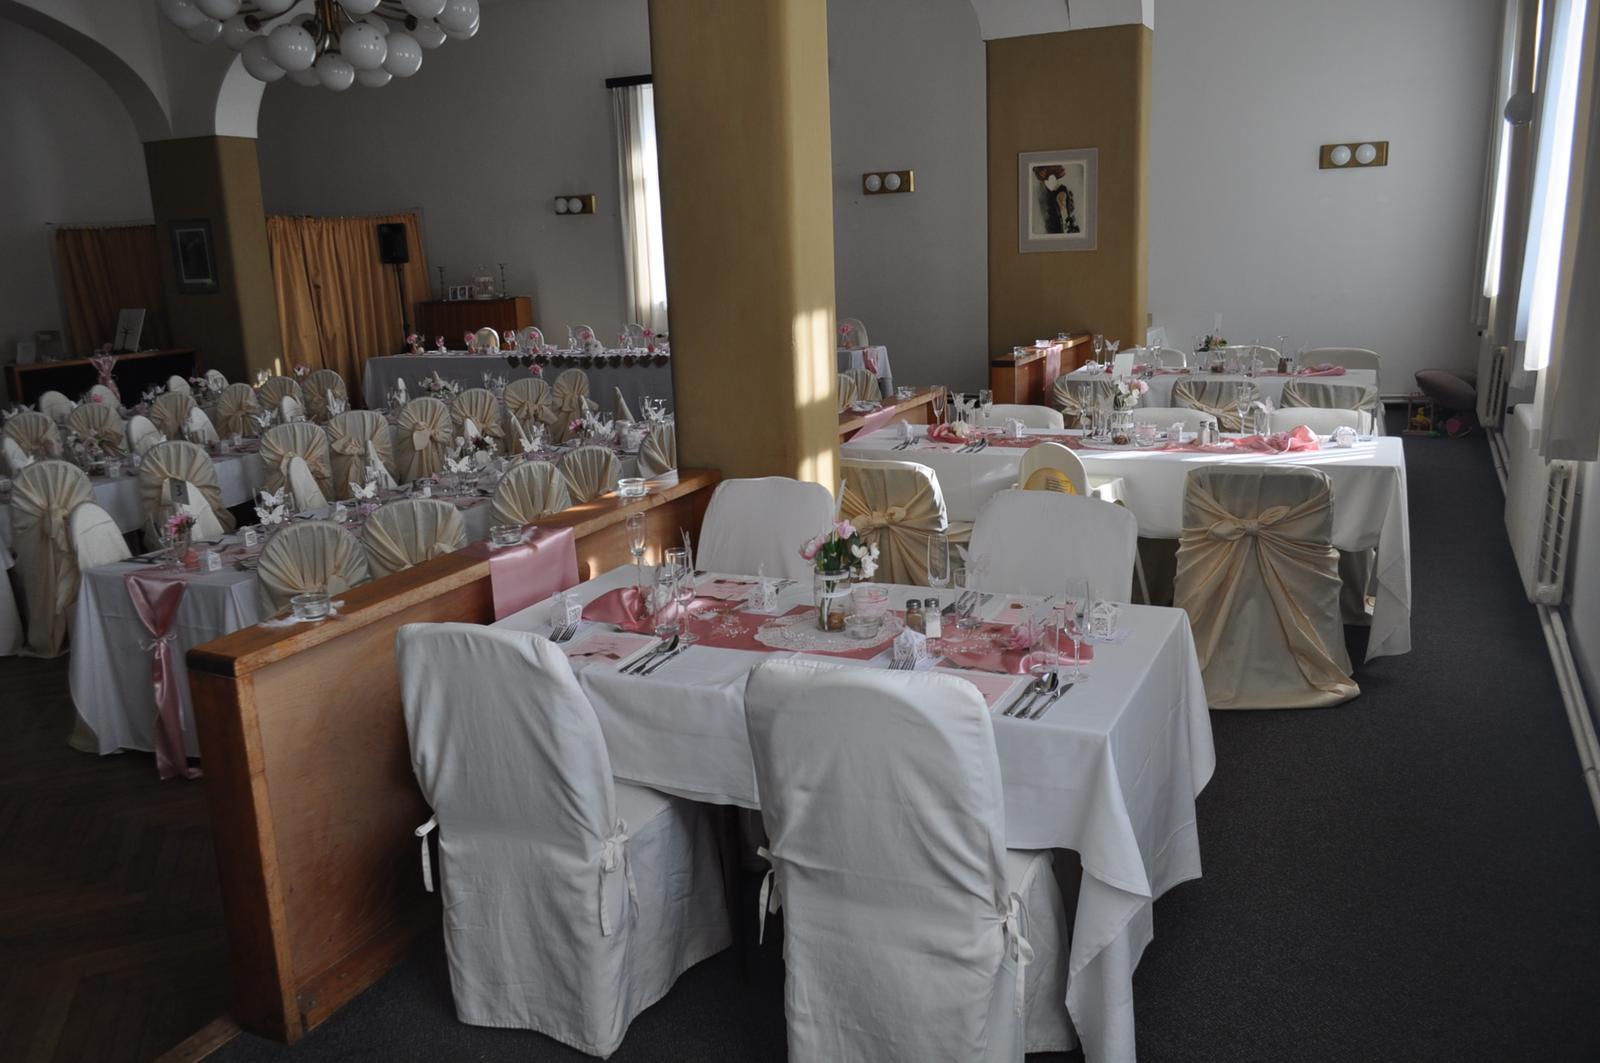 Svatby 2017 - svatební sál